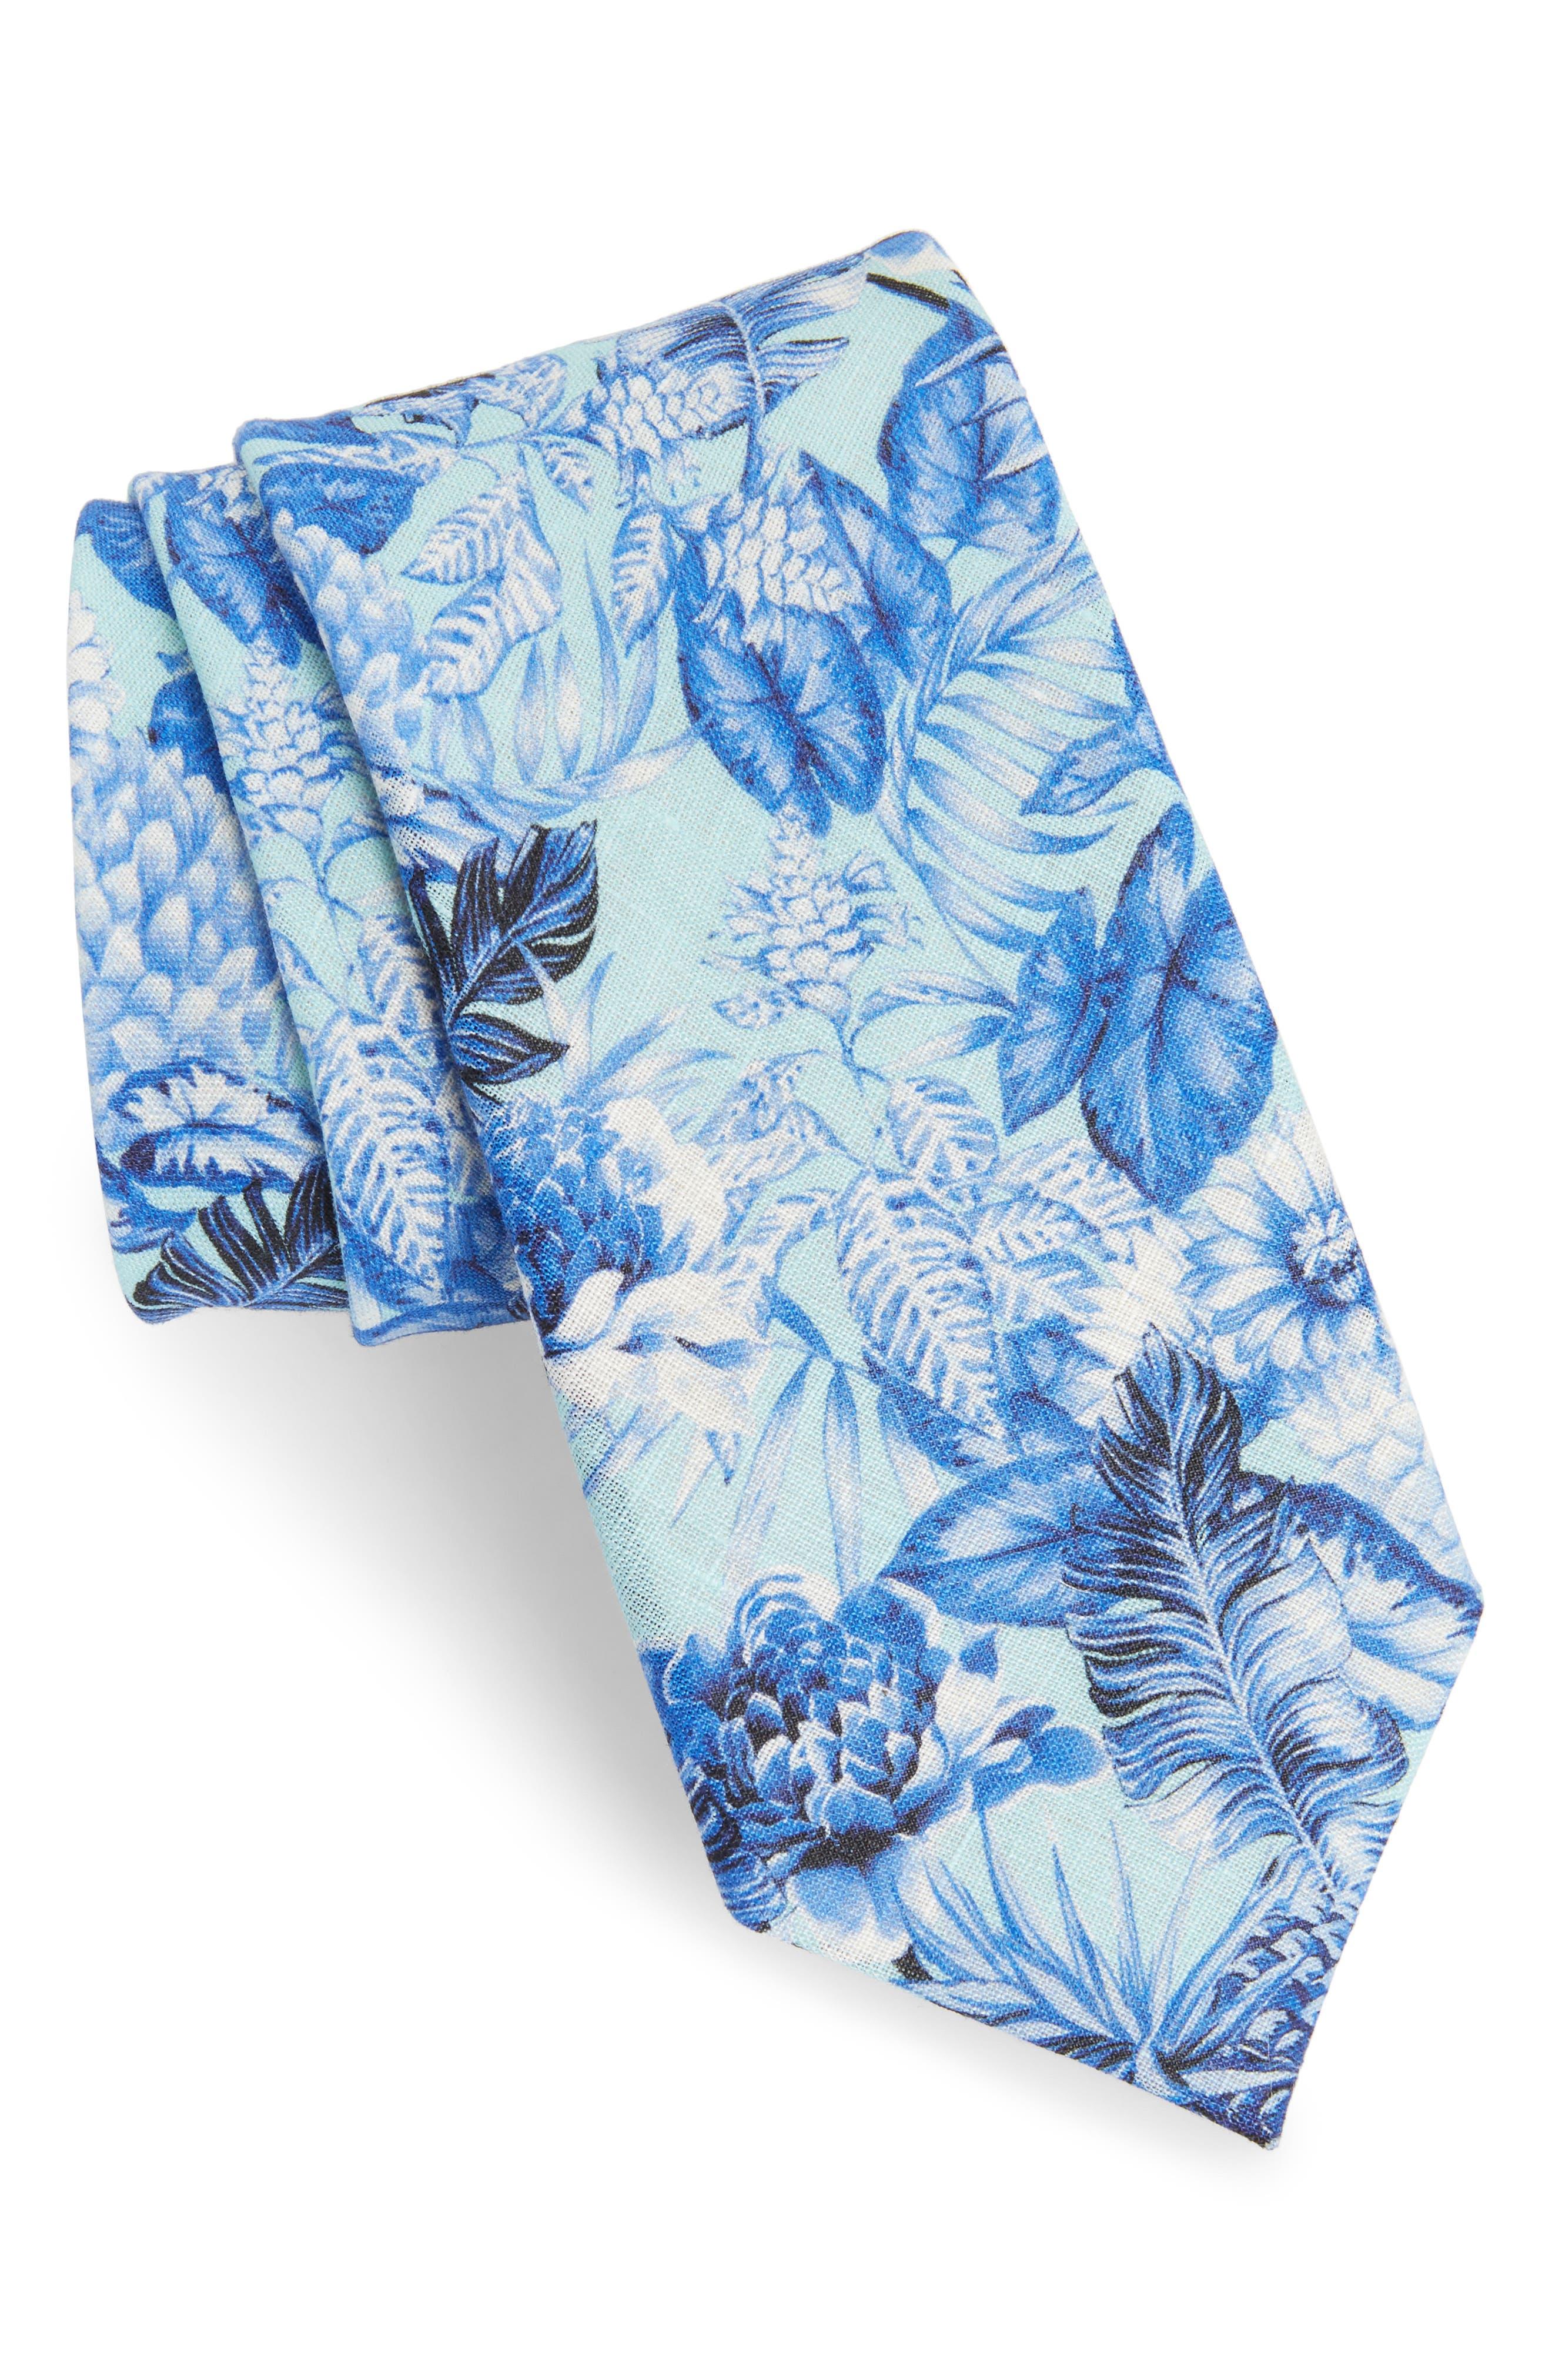 Tropic Fever Linen Tie,                             Main thumbnail 1, color,                             Island Paradise